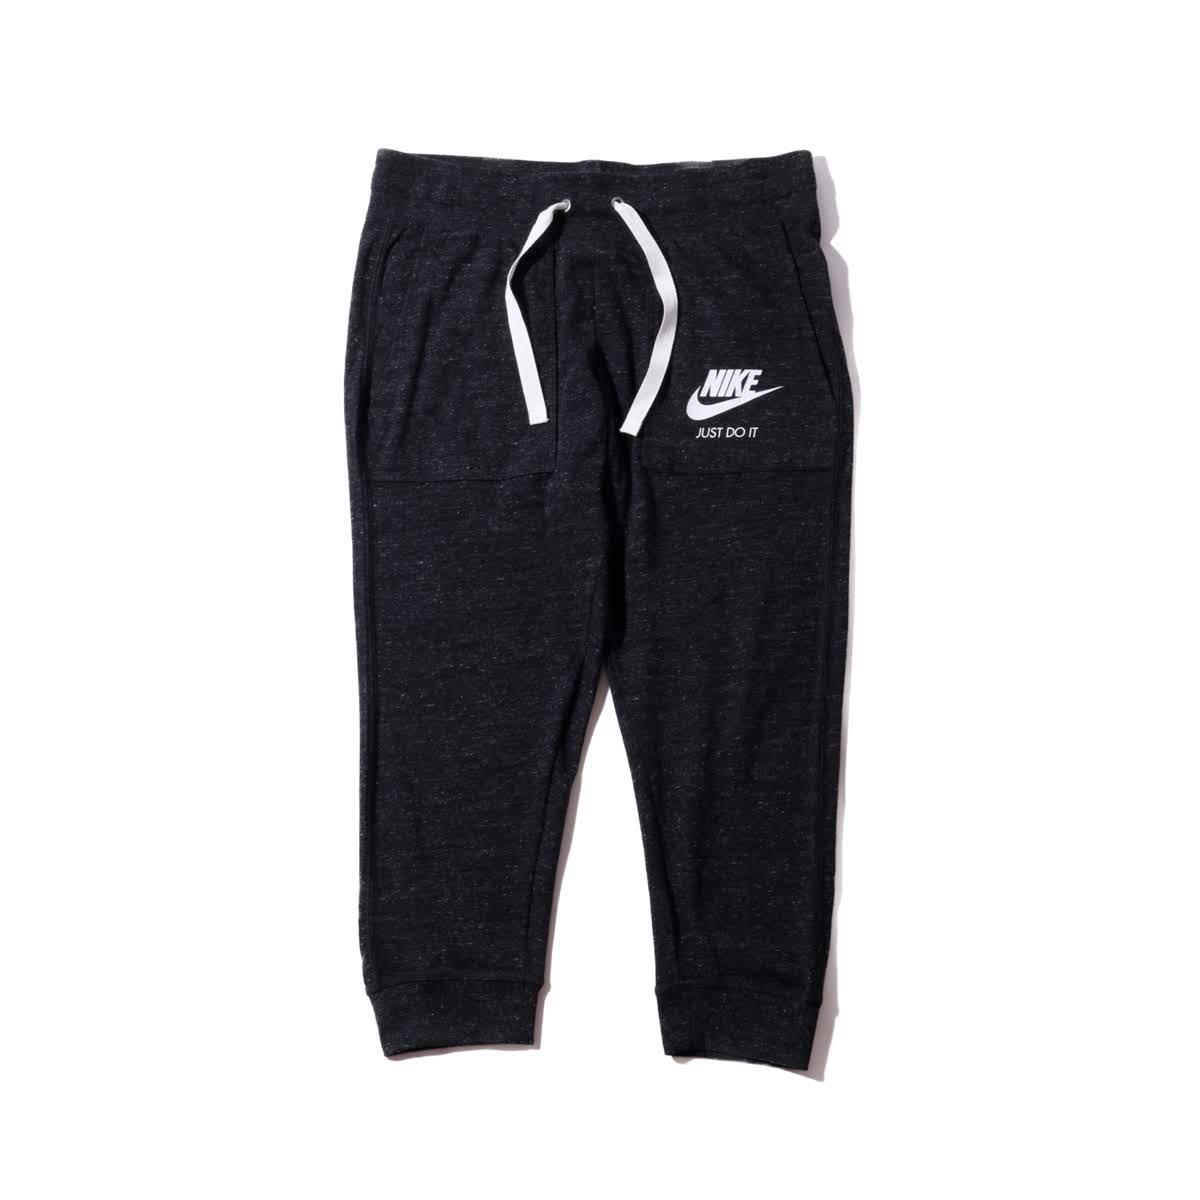 1cab587cd Kinetics: NIKE AS W NSW GYM VNTG CPRI (BLACK/SAIL) (Nike women gym ...